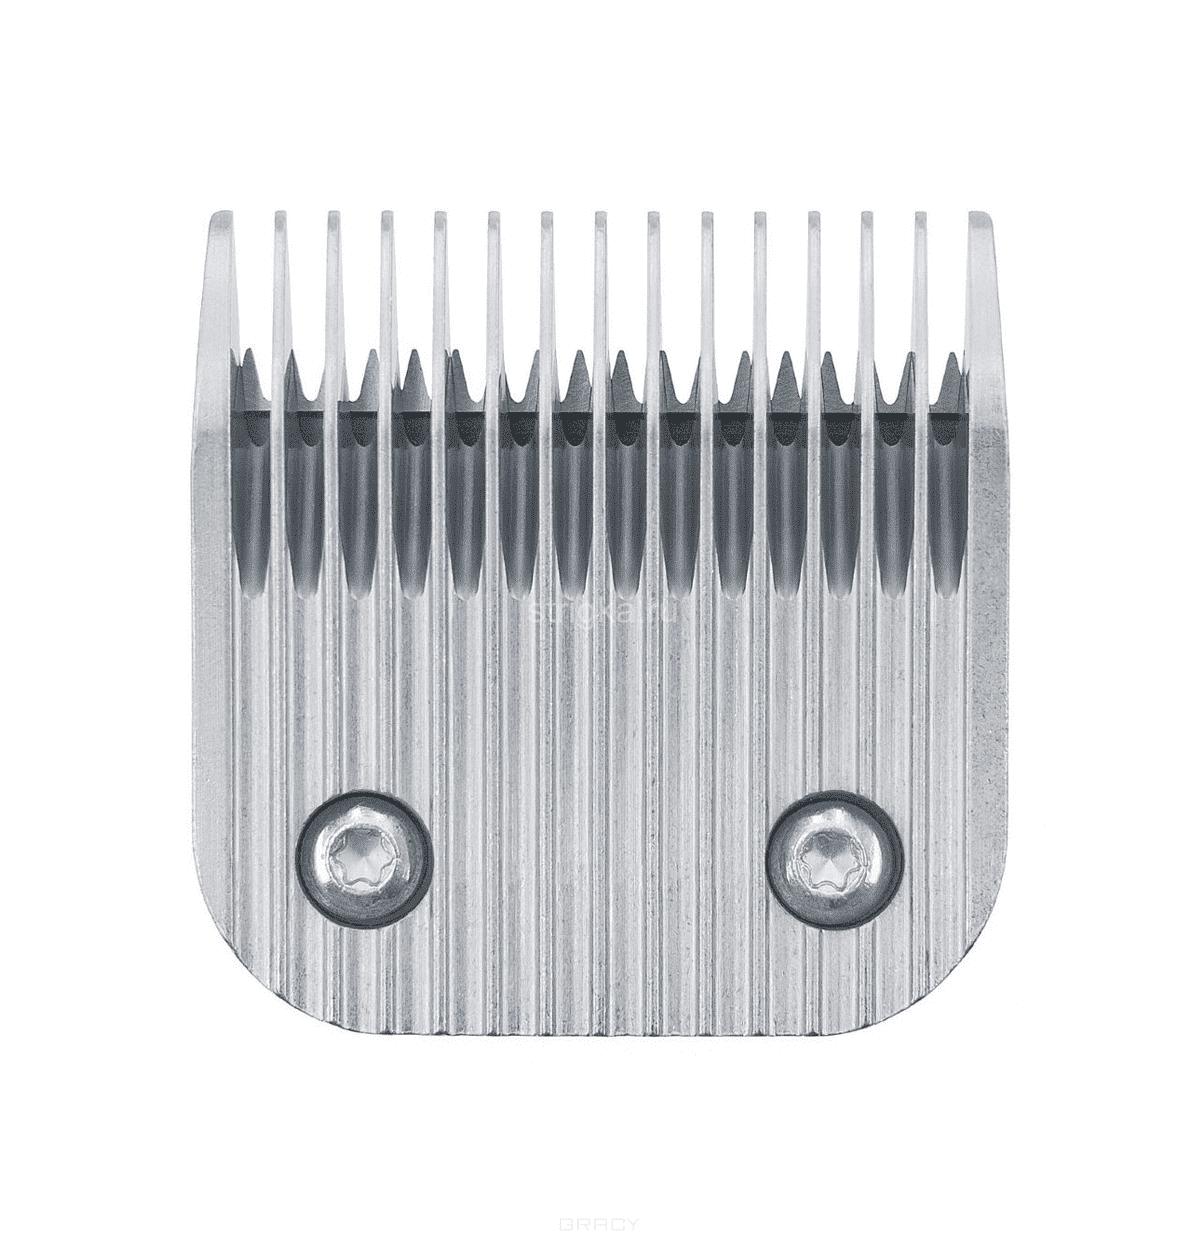 Moser Ножевой блок 1225-5870, 7 мм, стандарт А5 moser нож к машинкам 1854 и 1871 01 3 мм